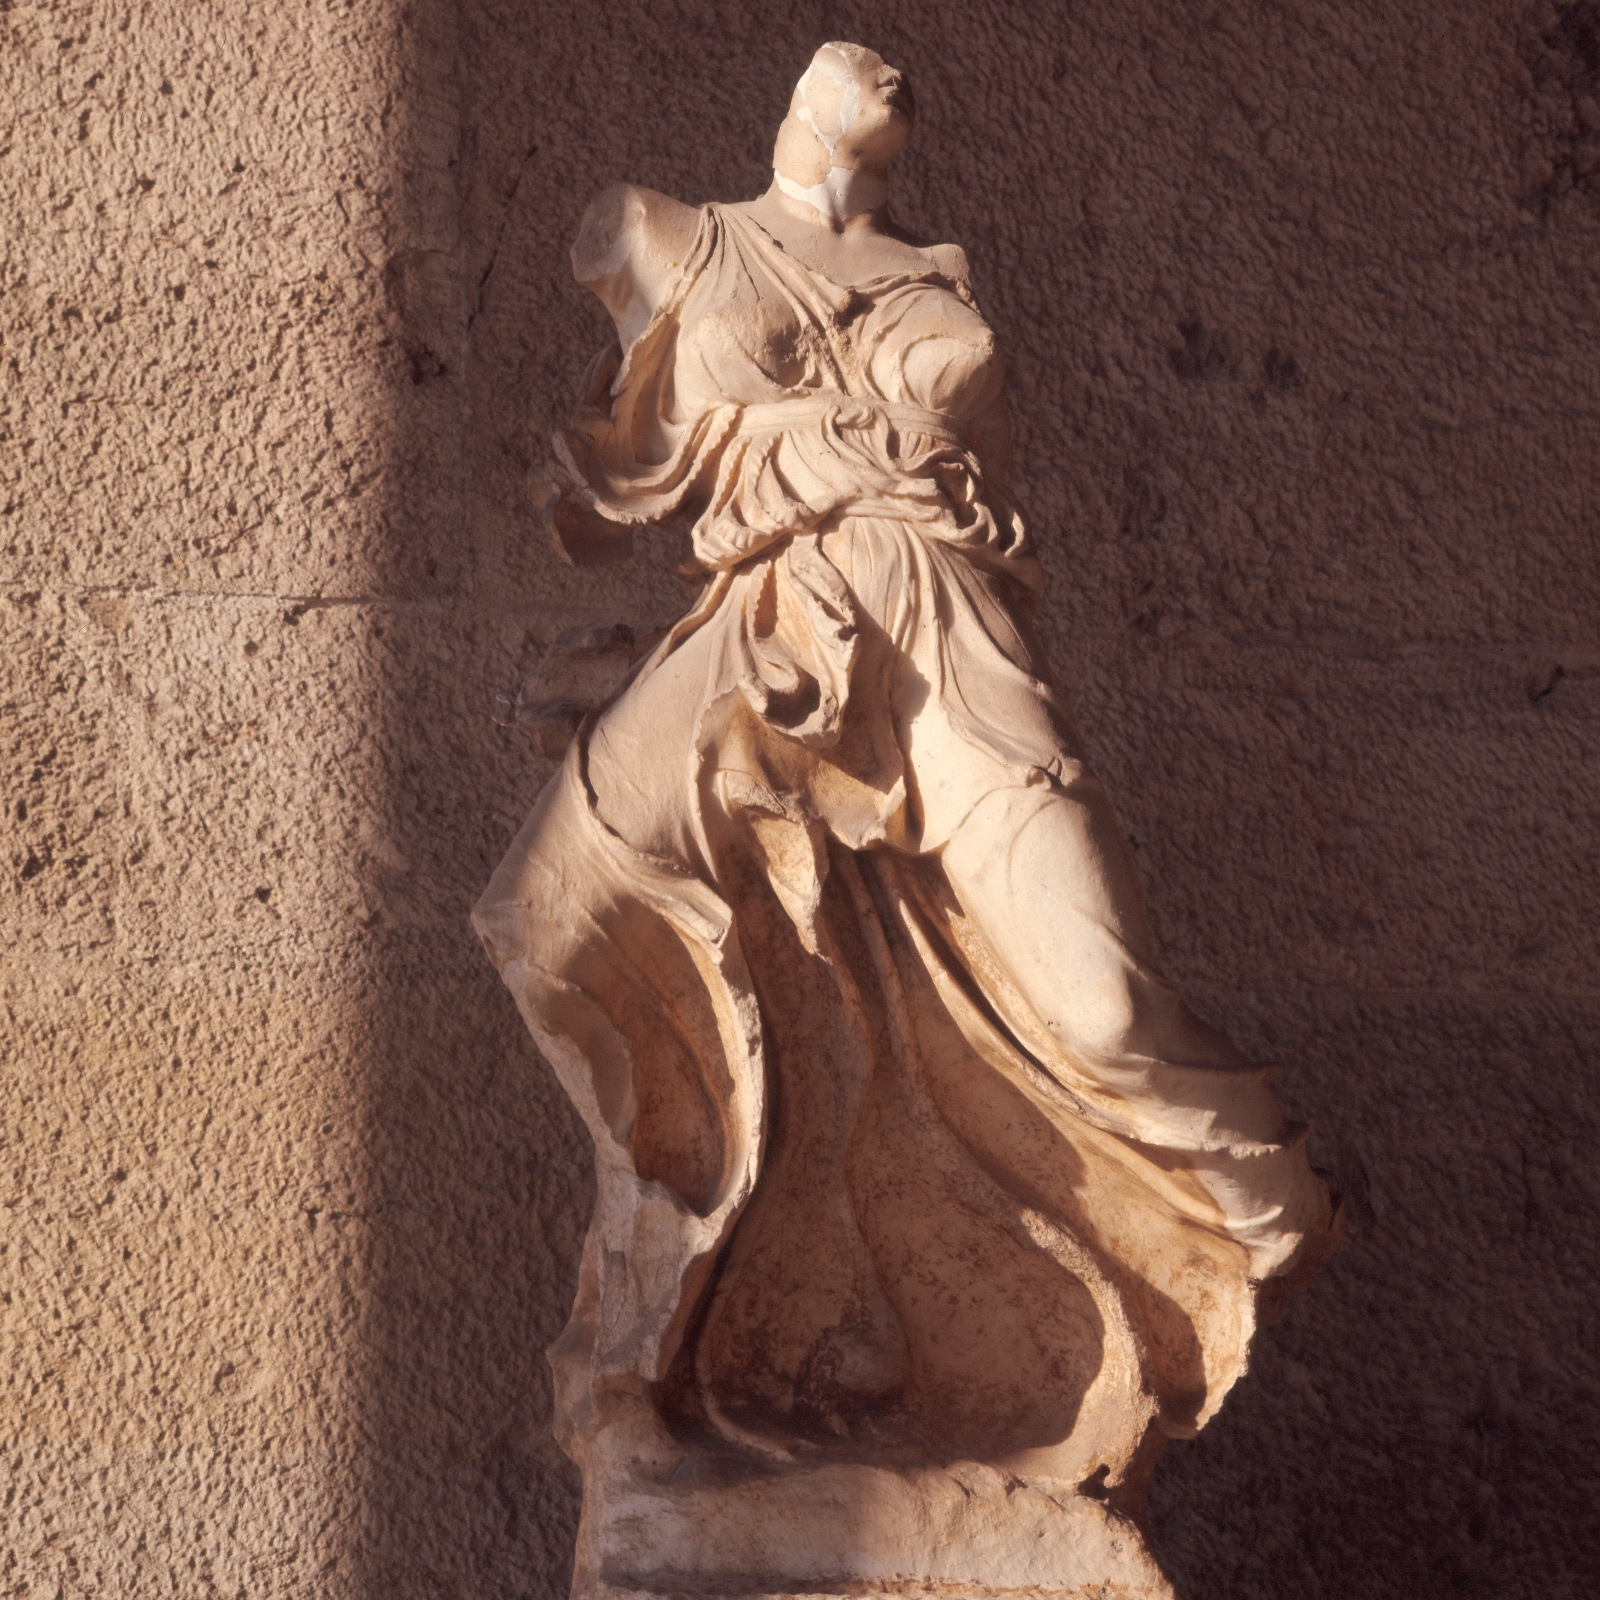 Афины. Музей Агоры. Крылатая Ника, конец V века до н.э.